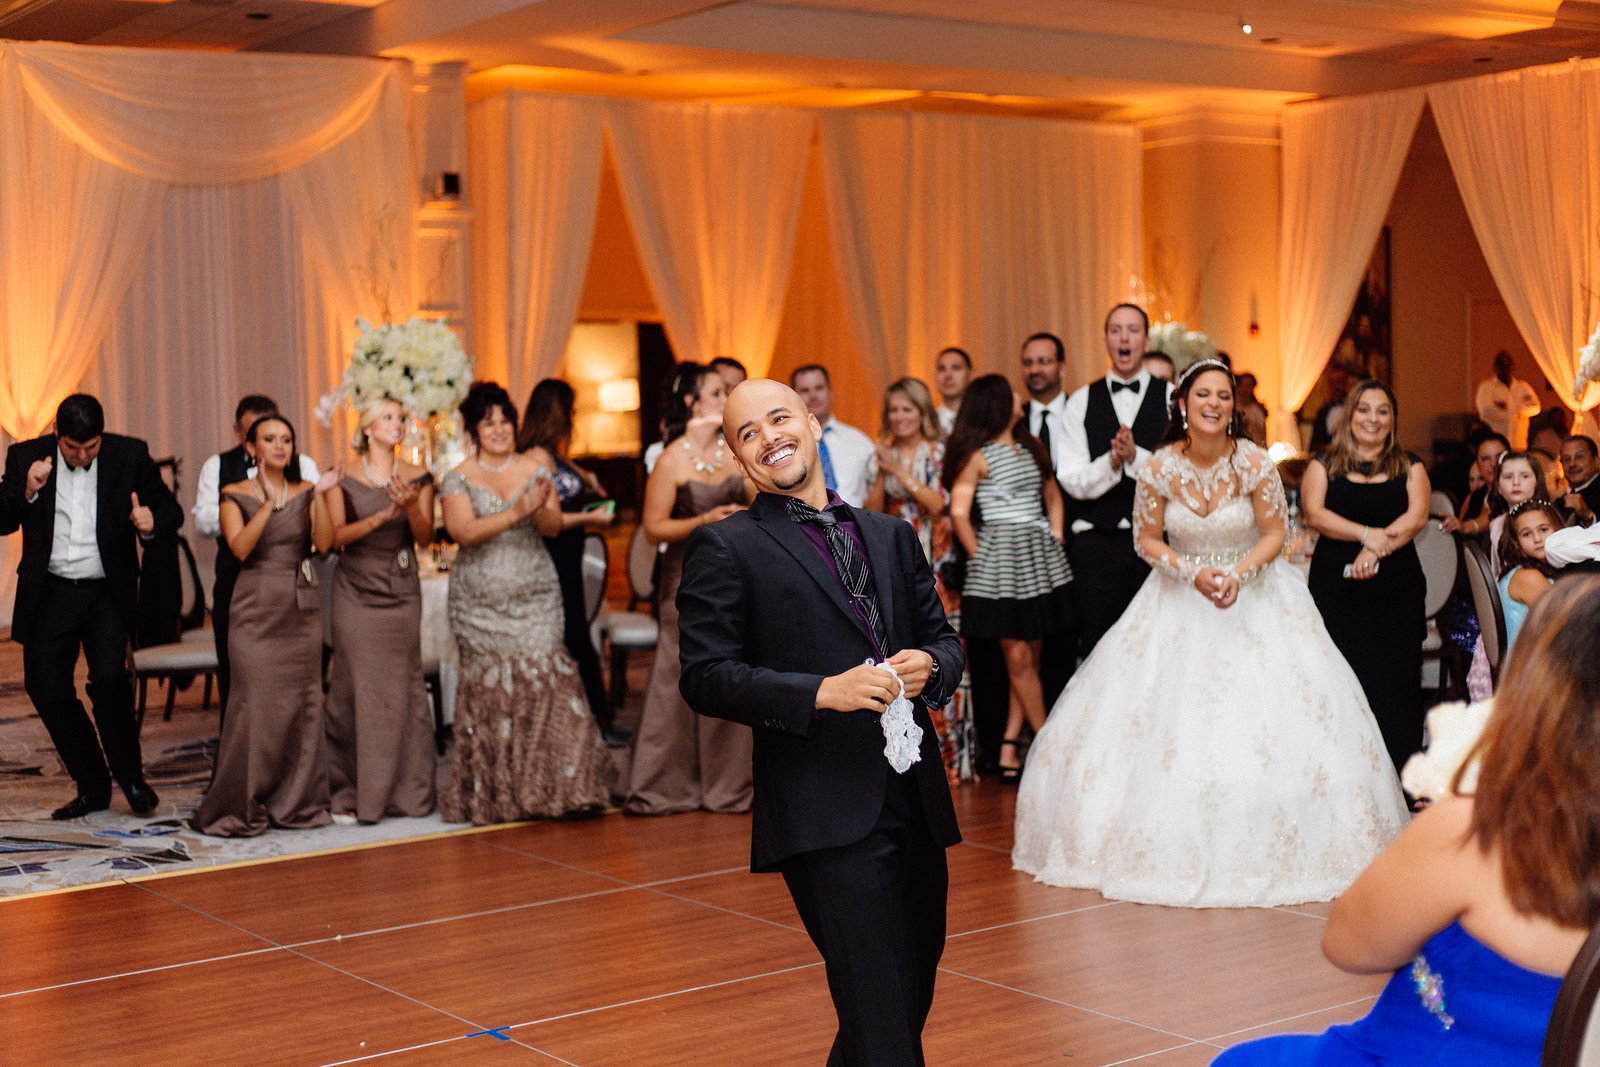 South-Florida-Wedding-Photographer-Andreo-5D3_5441